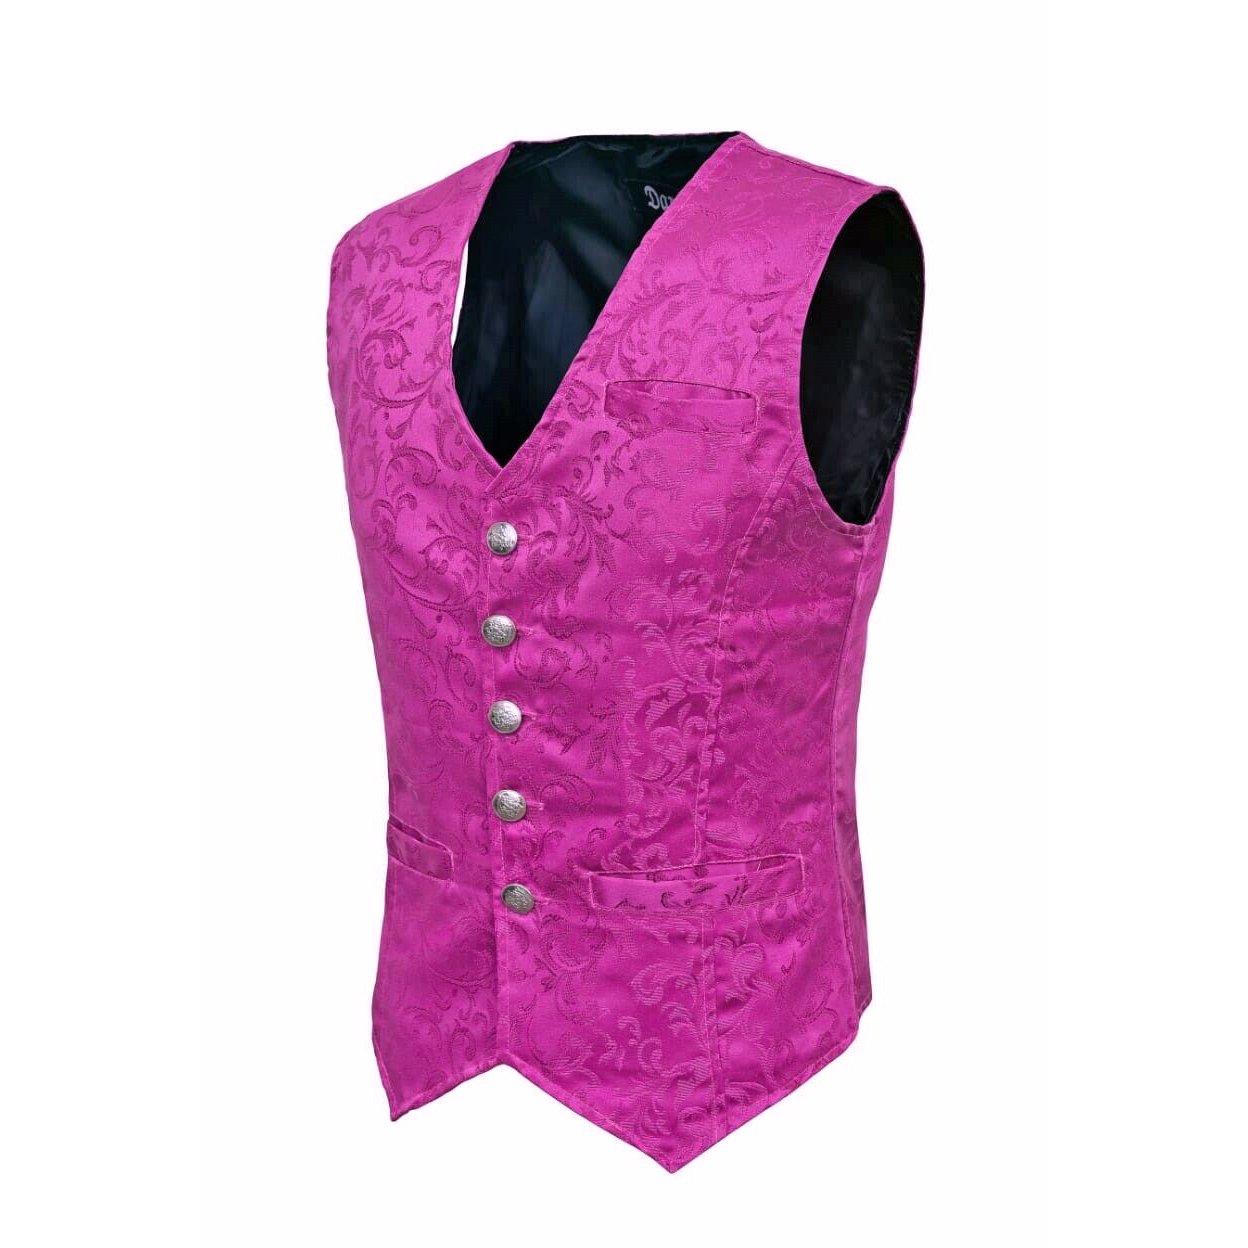 DARKROCK Waistcoat Gothic Steampunk Purple Vest(side)